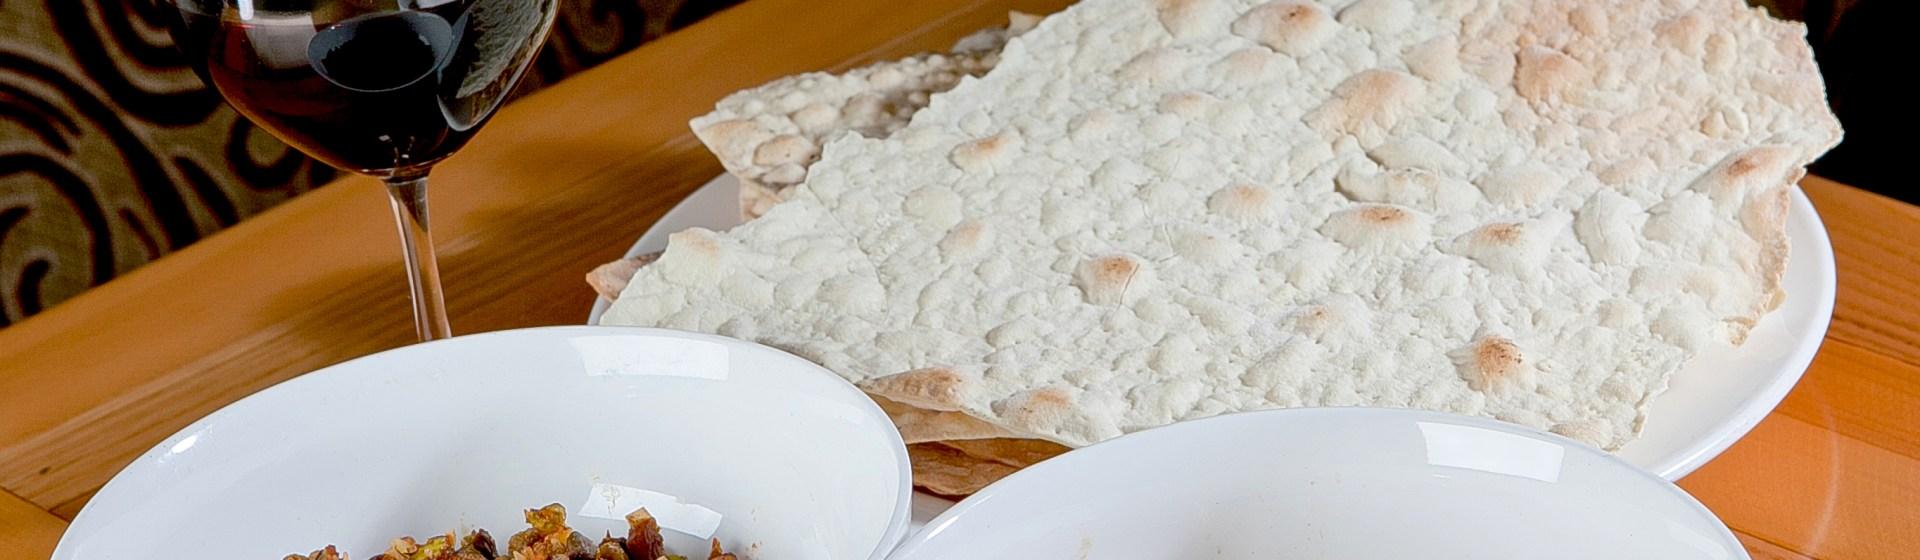 Passover Helper: An Easy Homemade Matzo Recipe - Food Republic